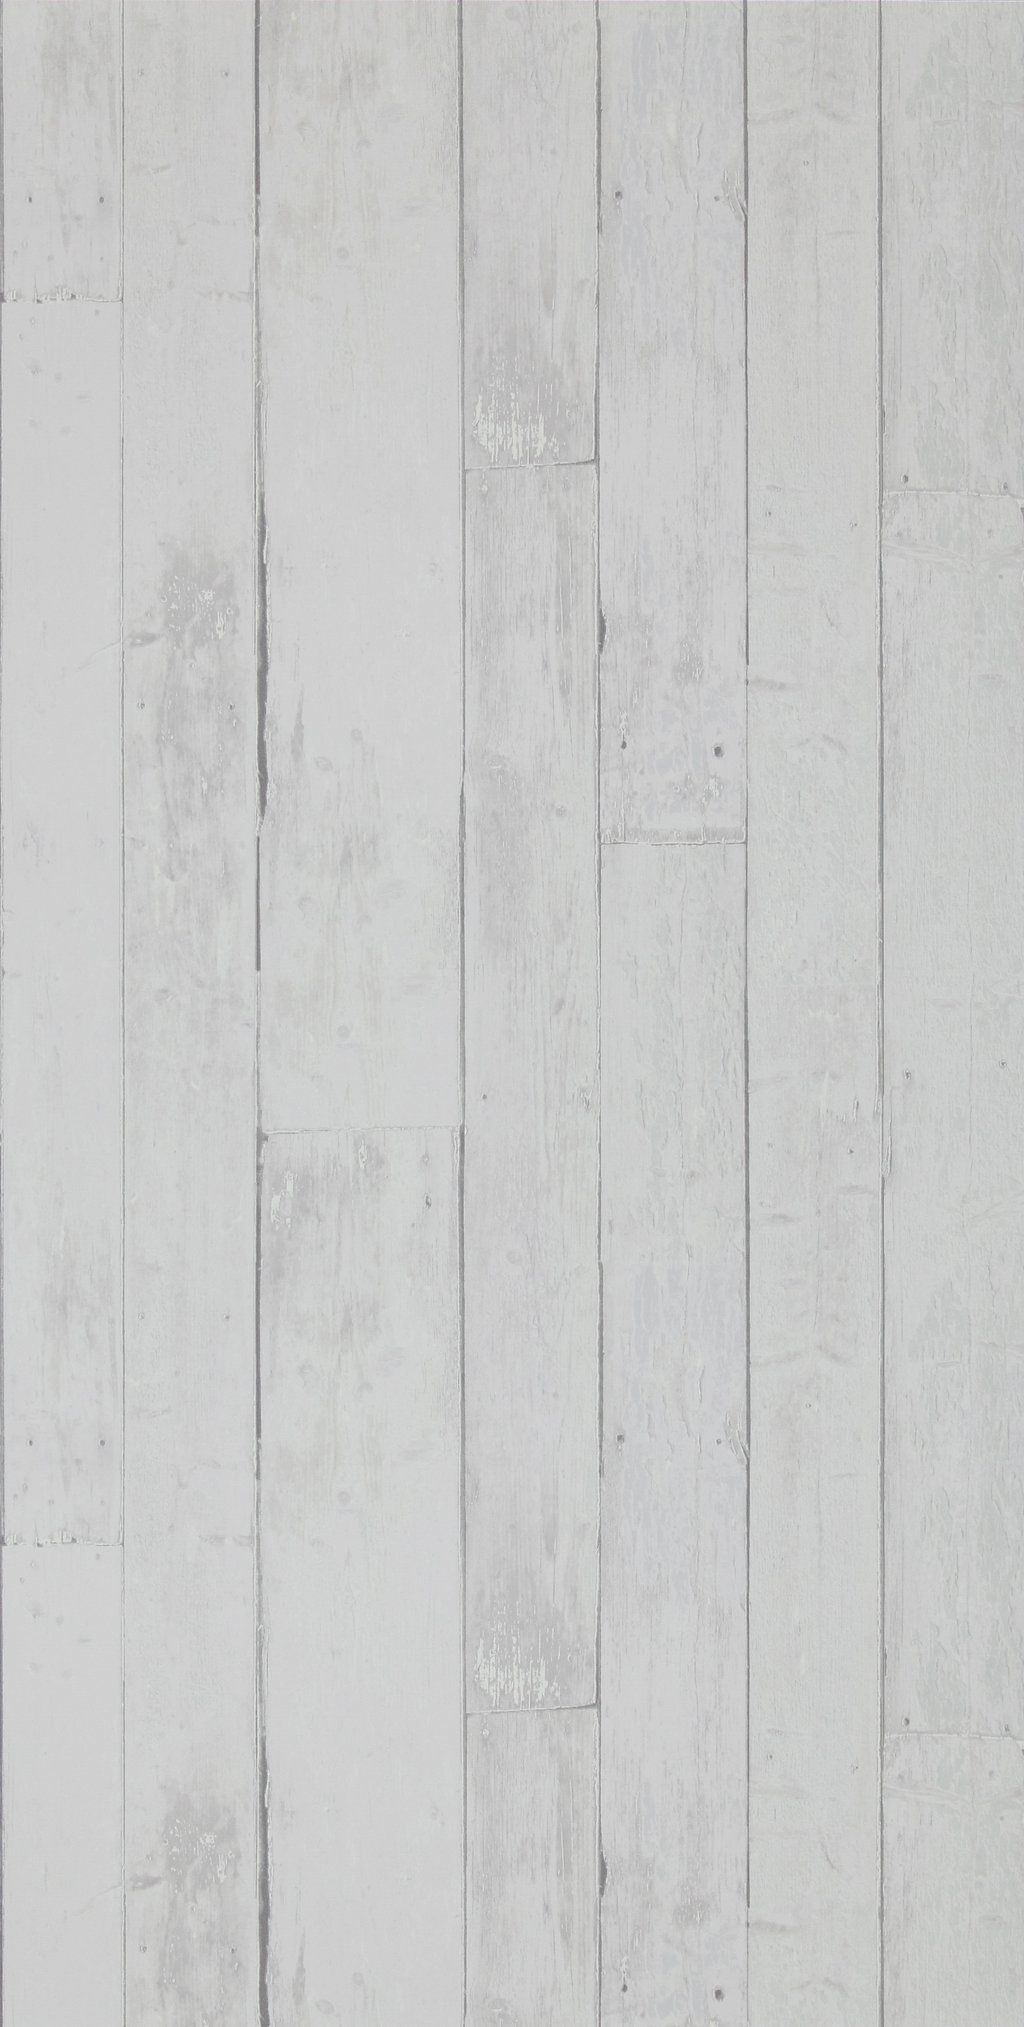 Light Grey Aesthetic Wallpapers - Top Free Light Grey ...